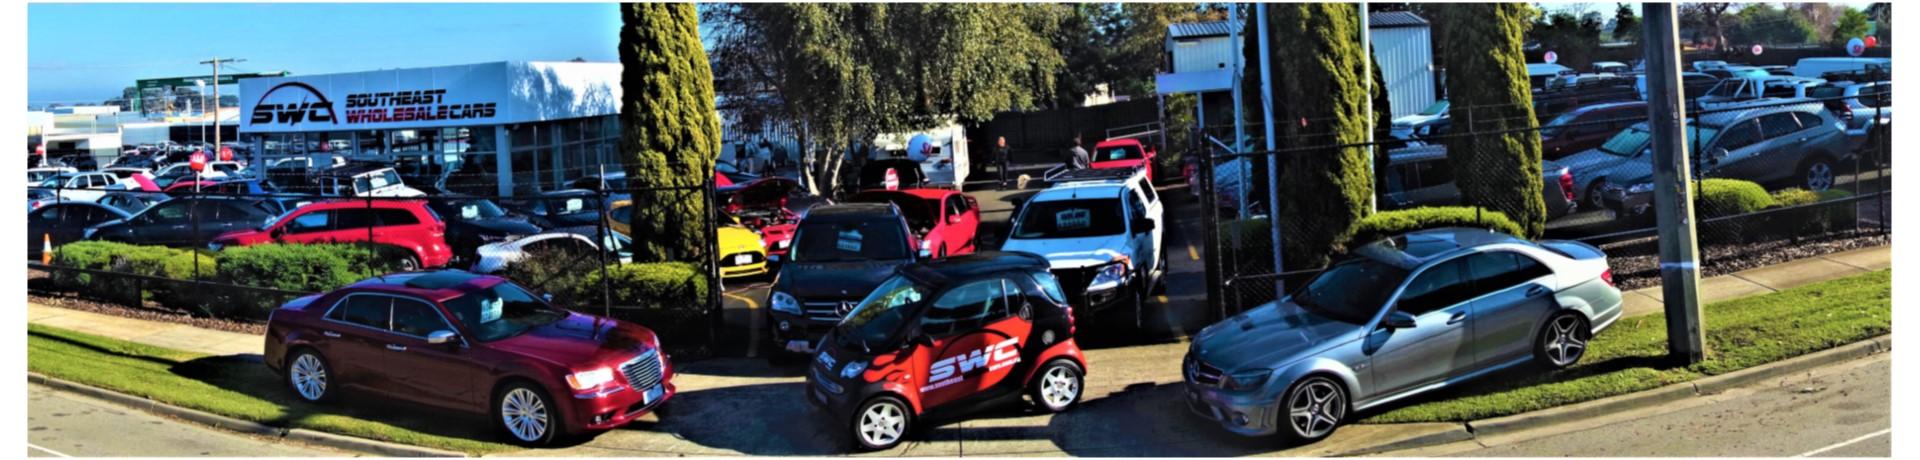 Used cars frankston car dealers wholesale car sales seaford